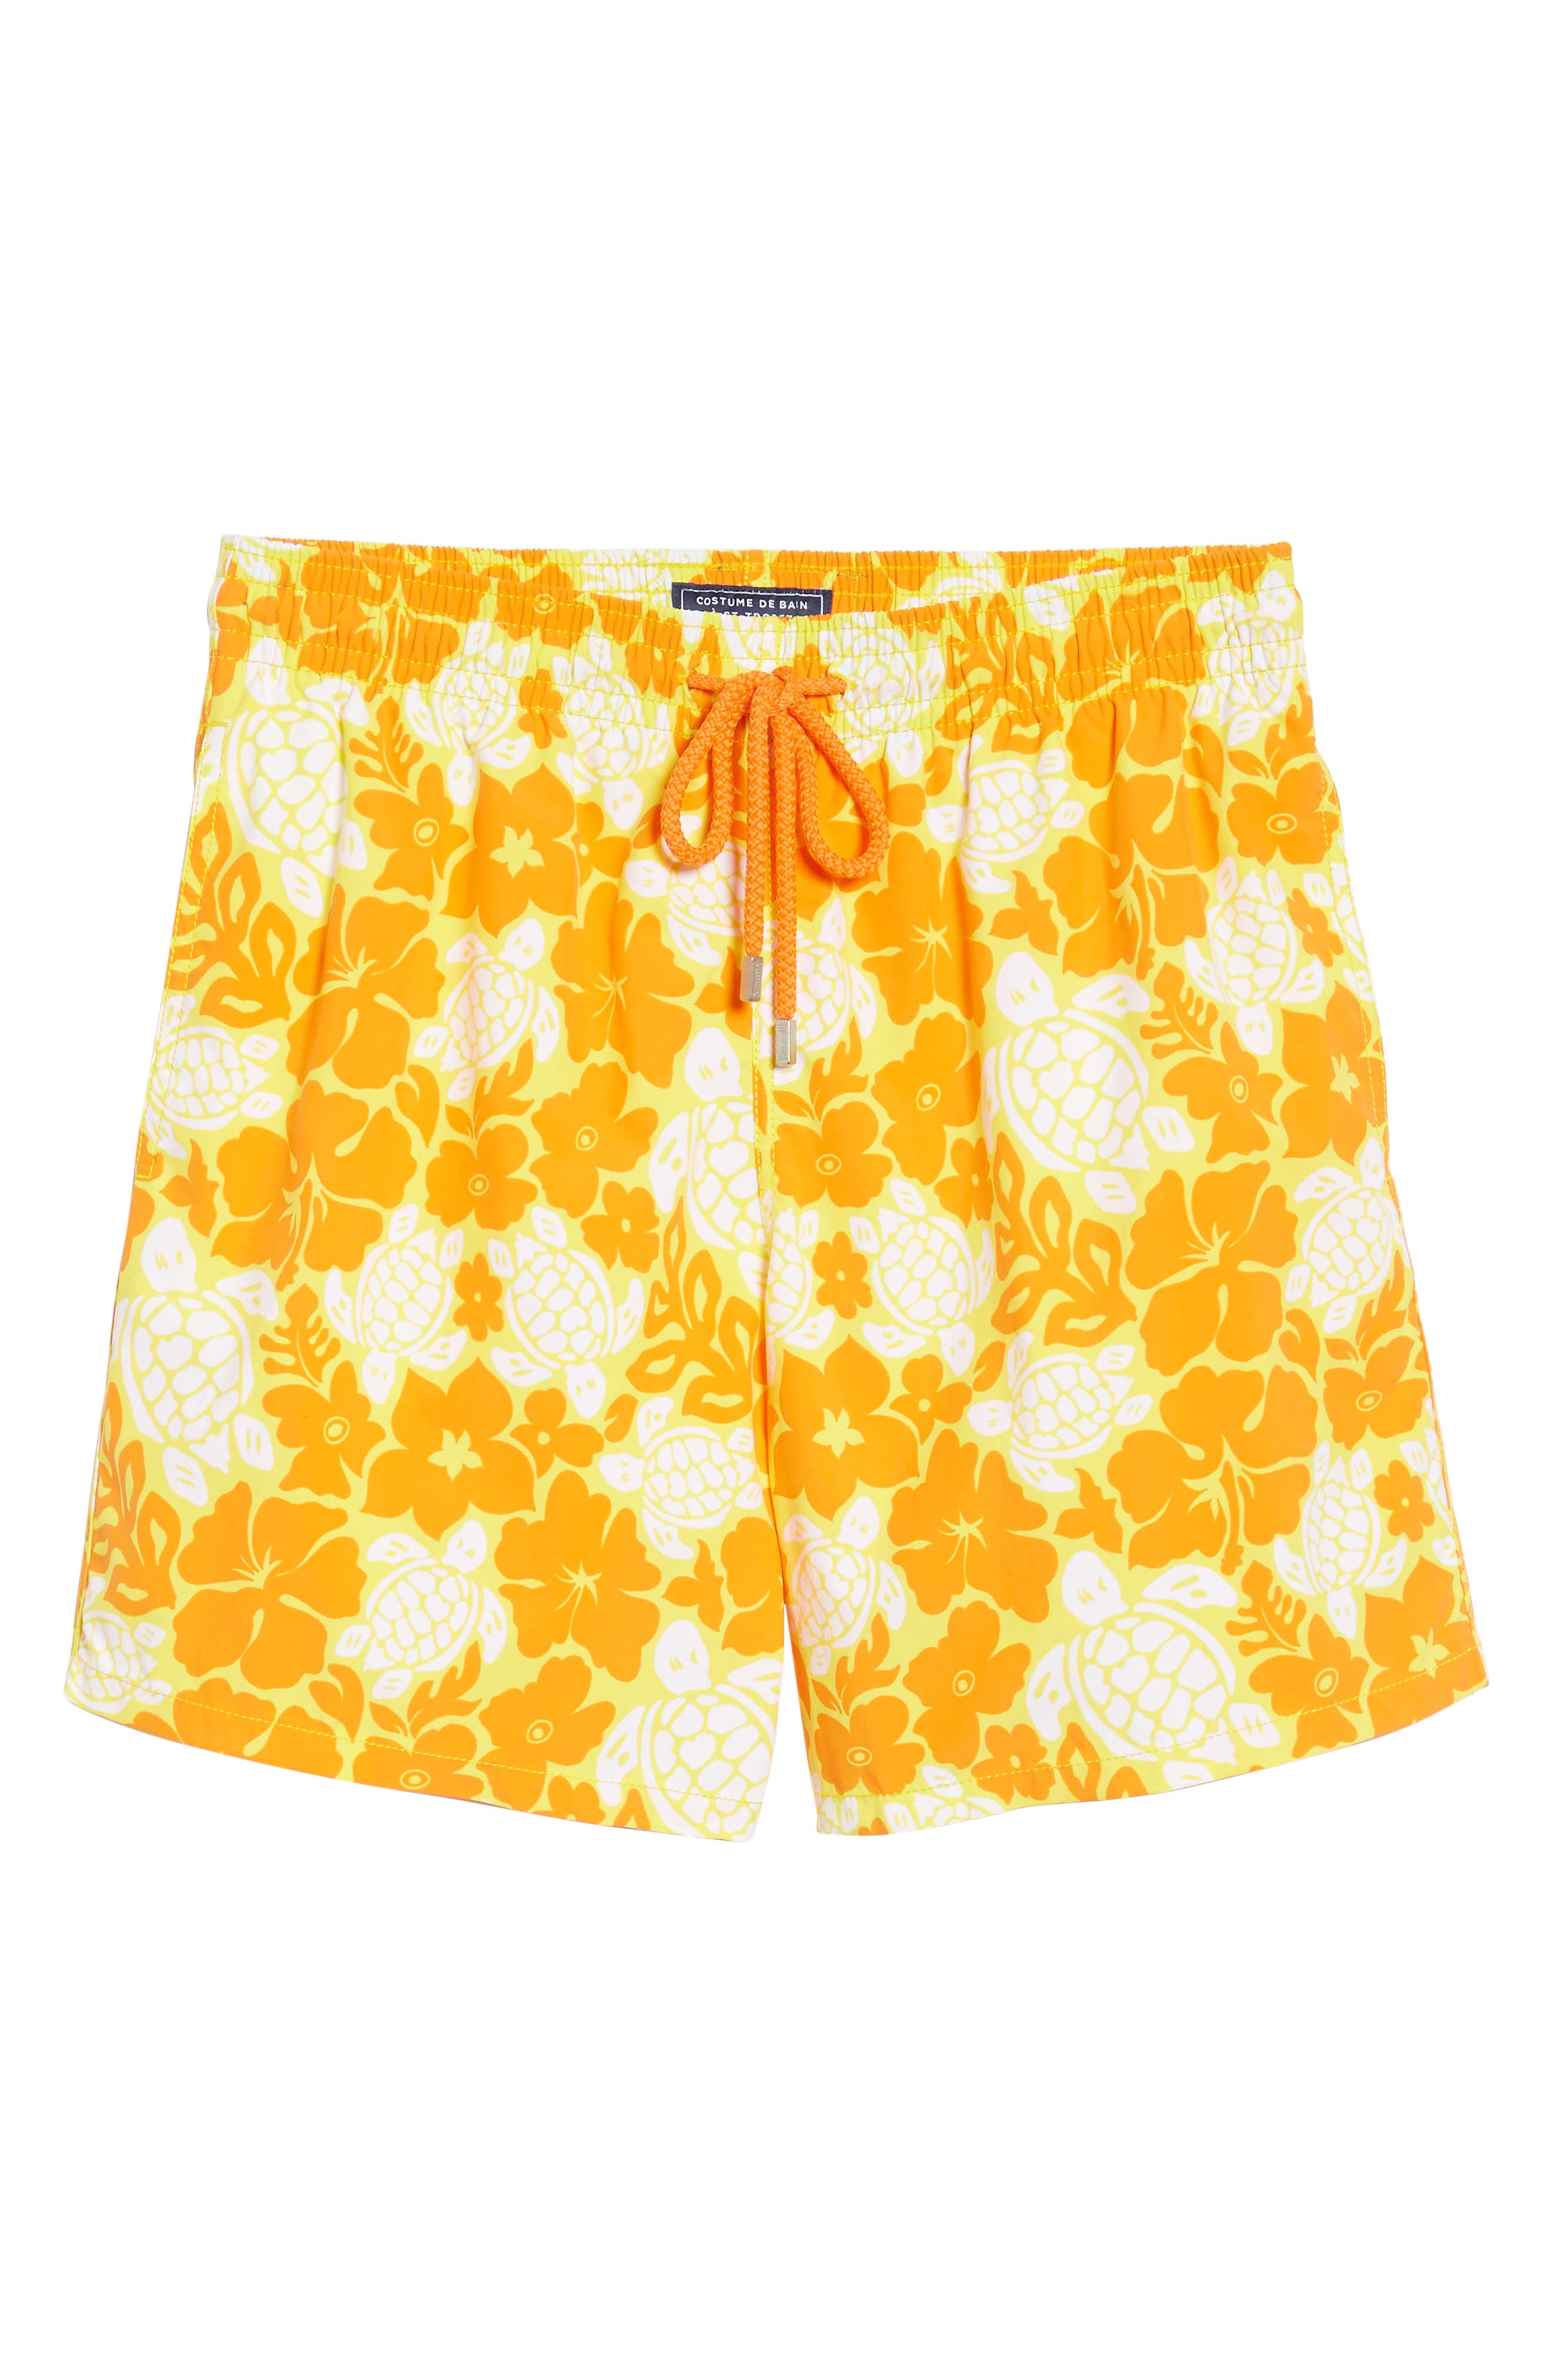 Moorea Hawaiian Turtles Swim Shorts,                             Alternate thumbnail 6, color,                             Lemon